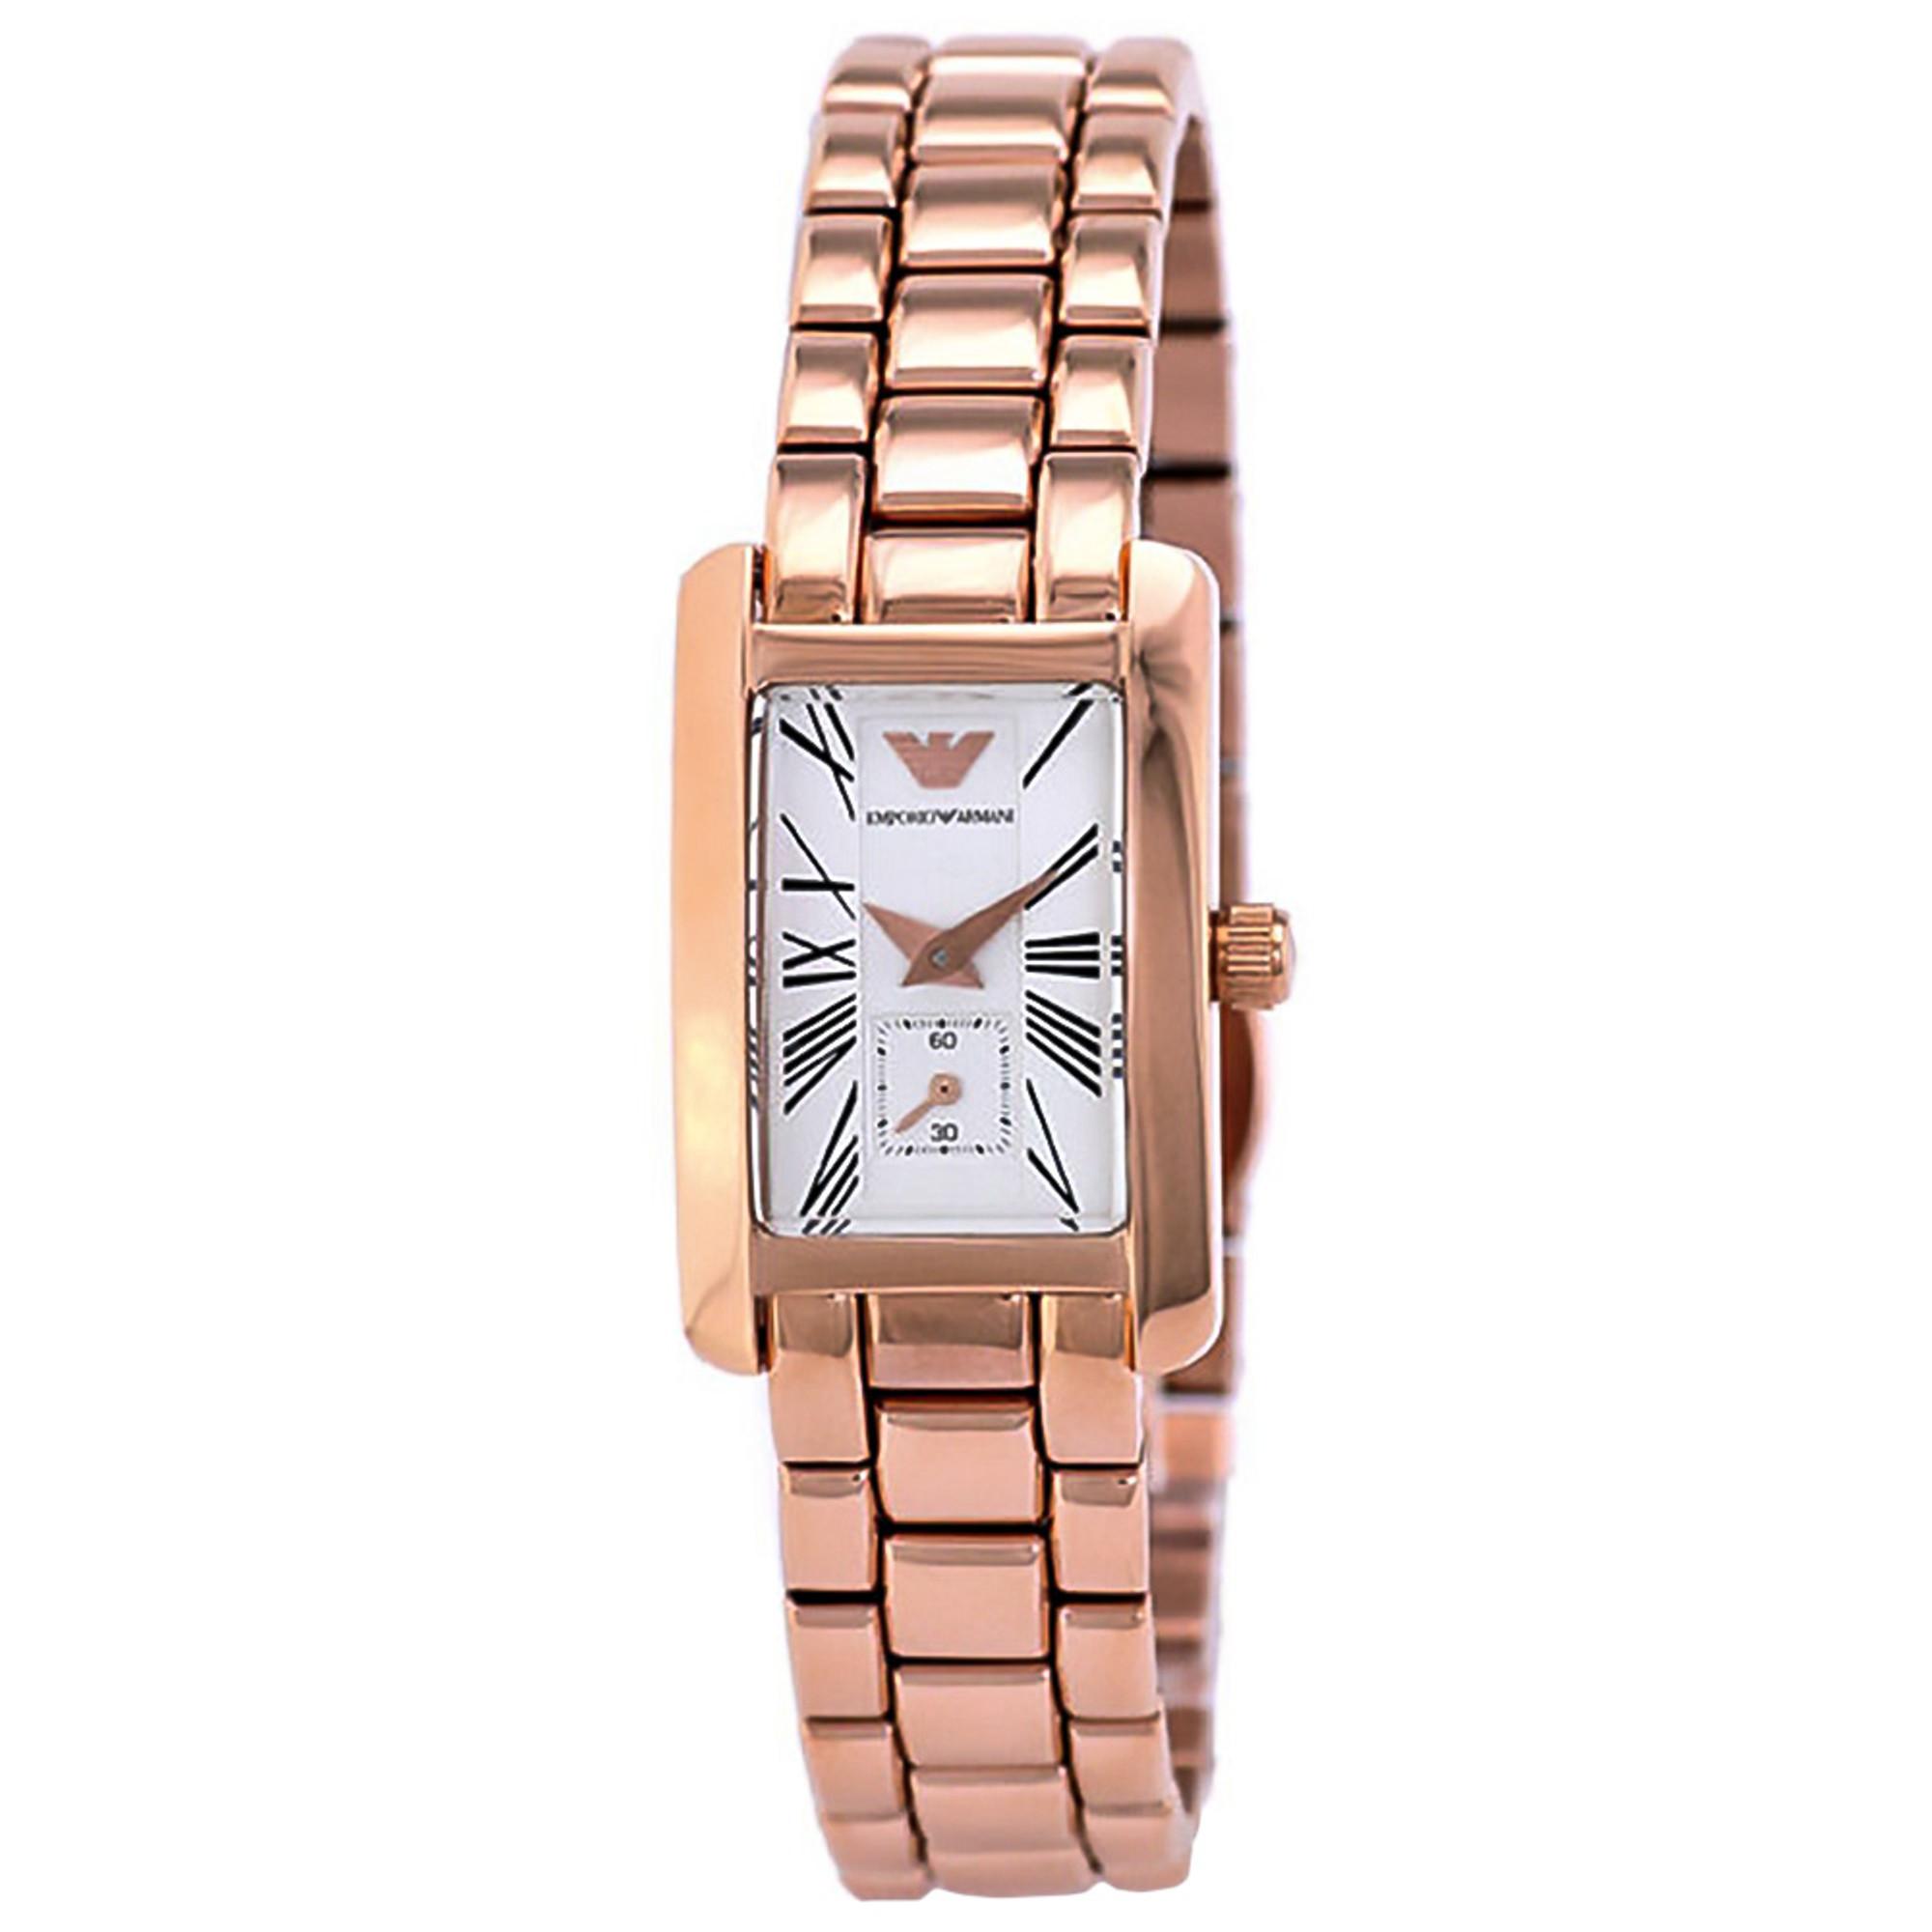 EMPORIO ARMANI Classic Watch AR0174